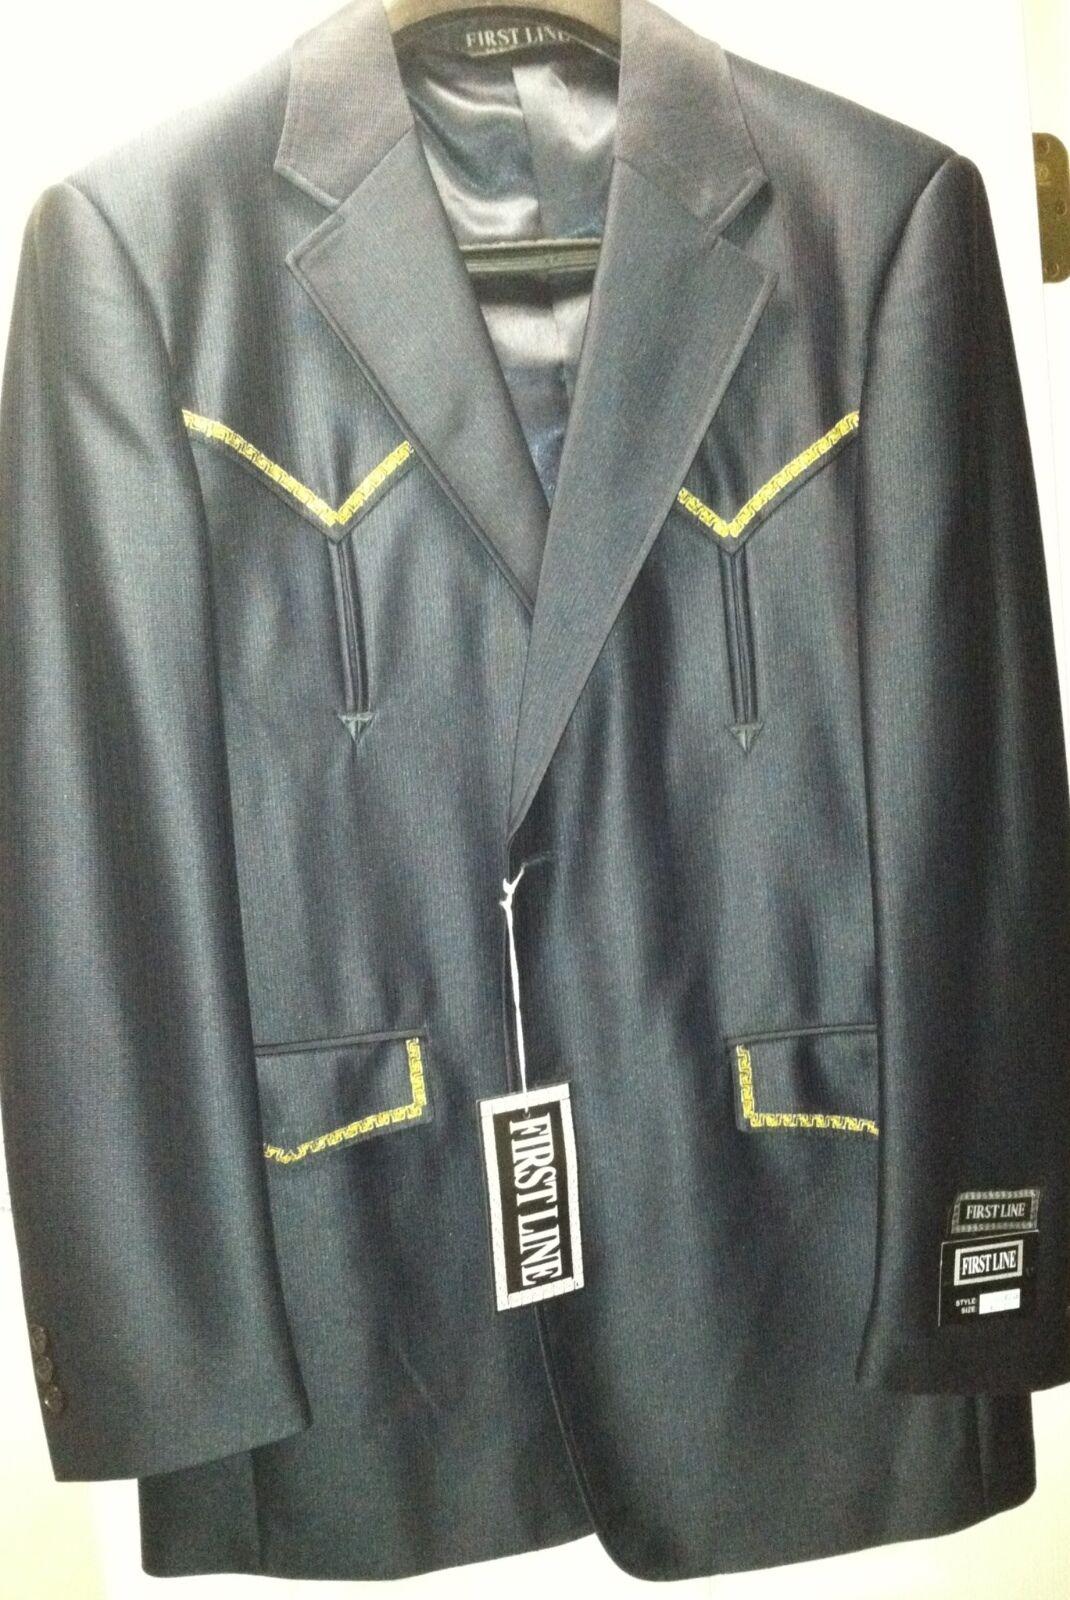 40 30 Mens Western Wear Cowboy Navy Suit